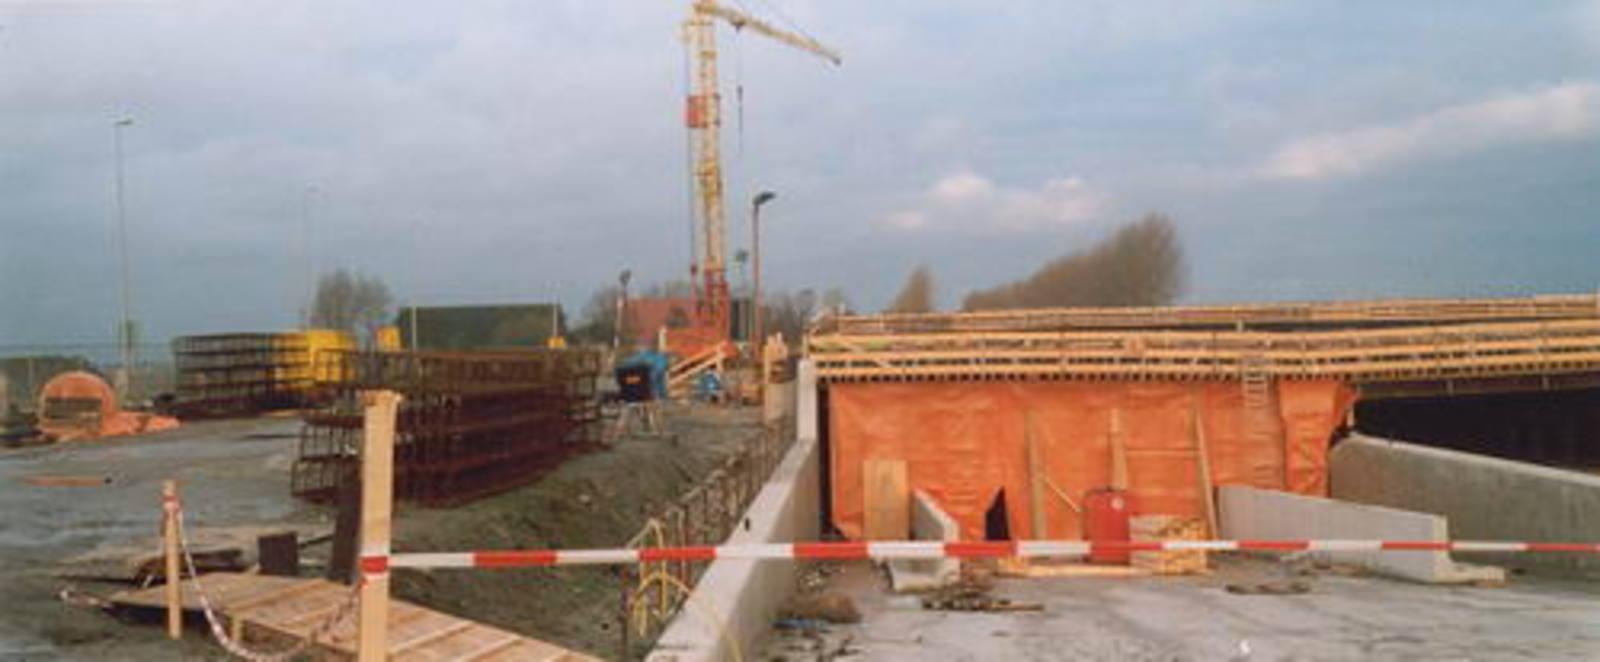 Hoofdweg W 0370± bouw Viaduct Taxibaan Schiphol 01